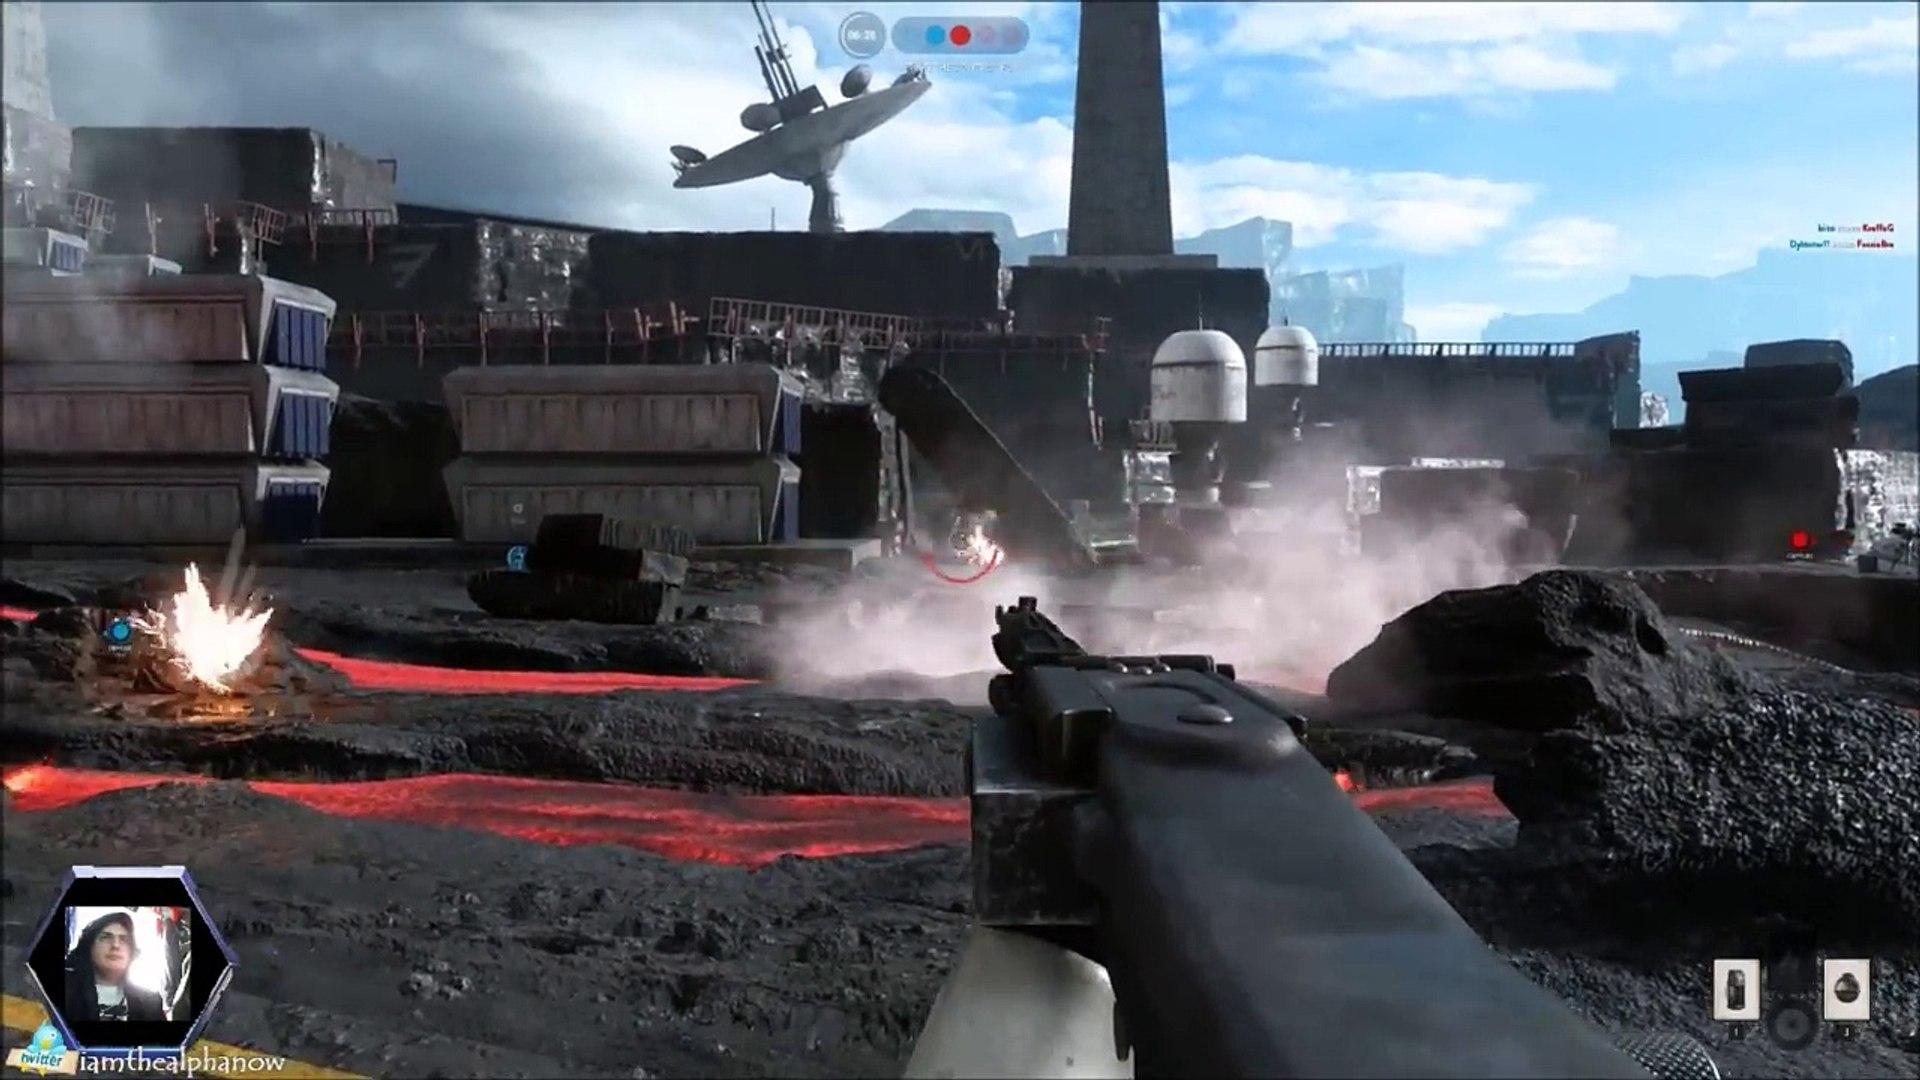 Star Wars Battlefront Episode 4: Storm troopers finally hit something